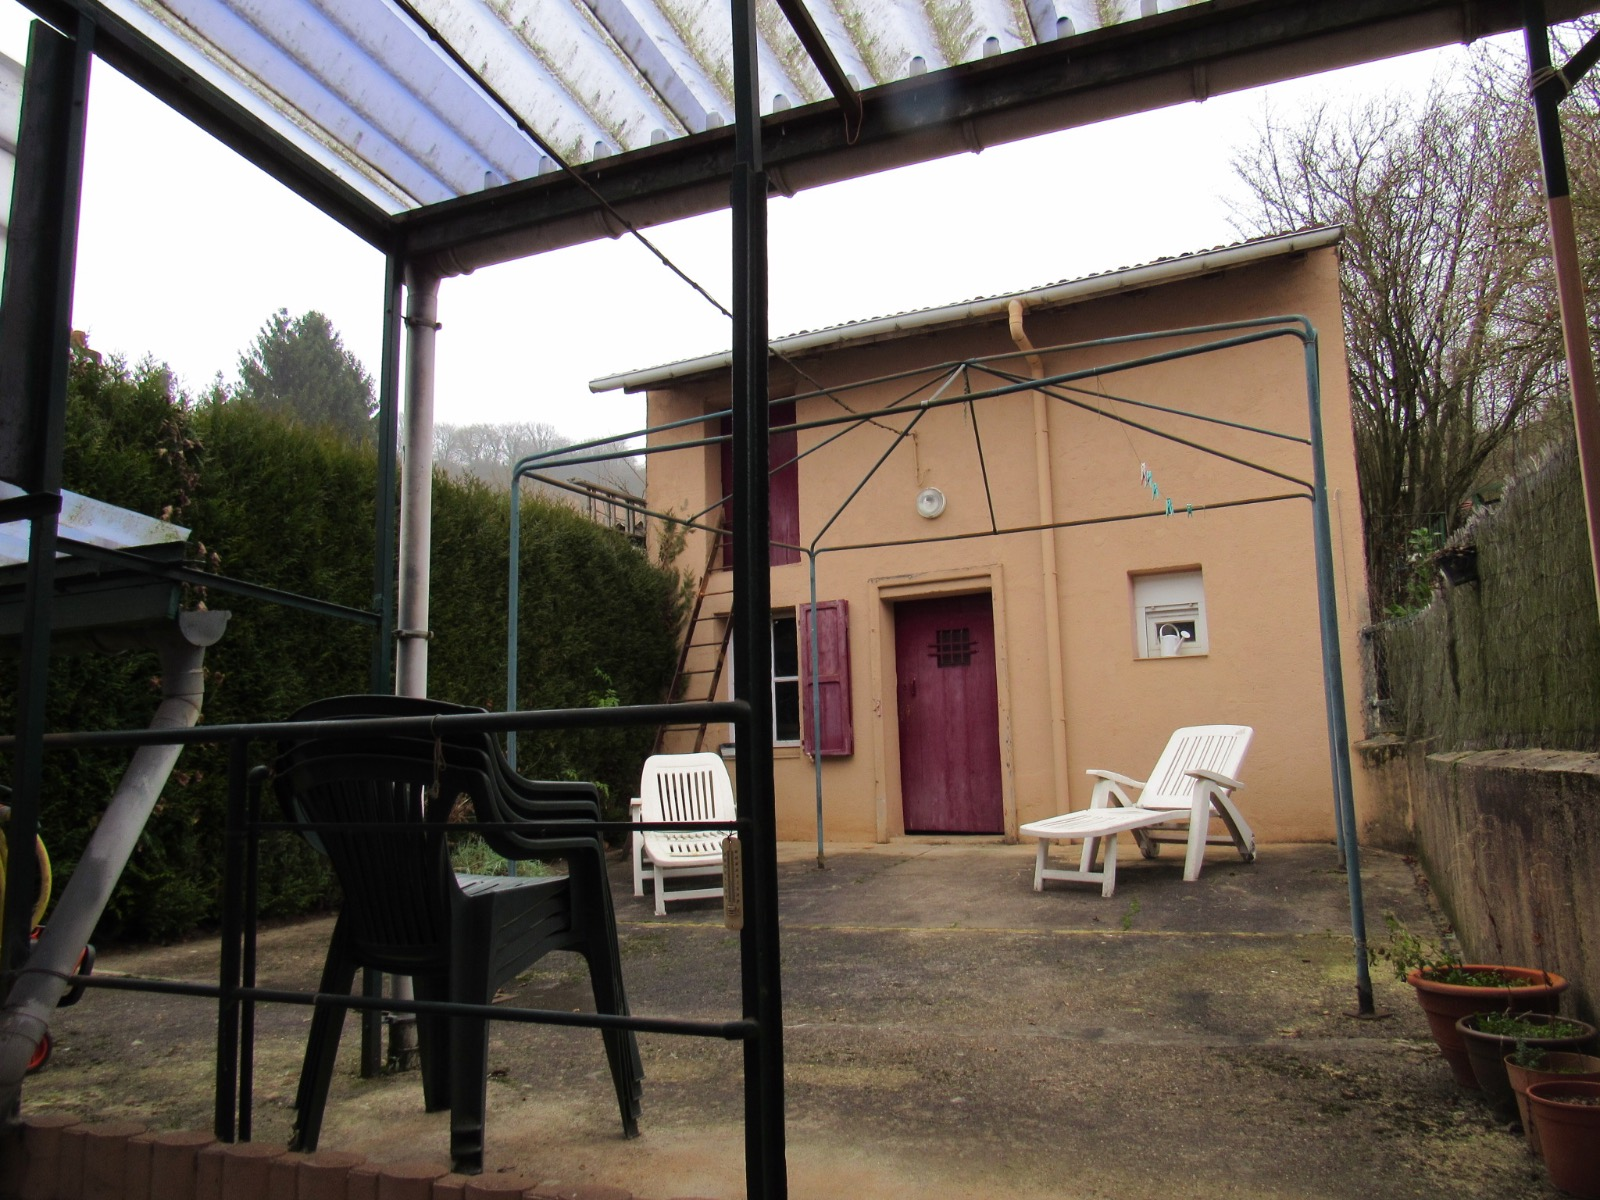 A vendre maison moyeuvre grande loc et vente immo for Achat maison yutz